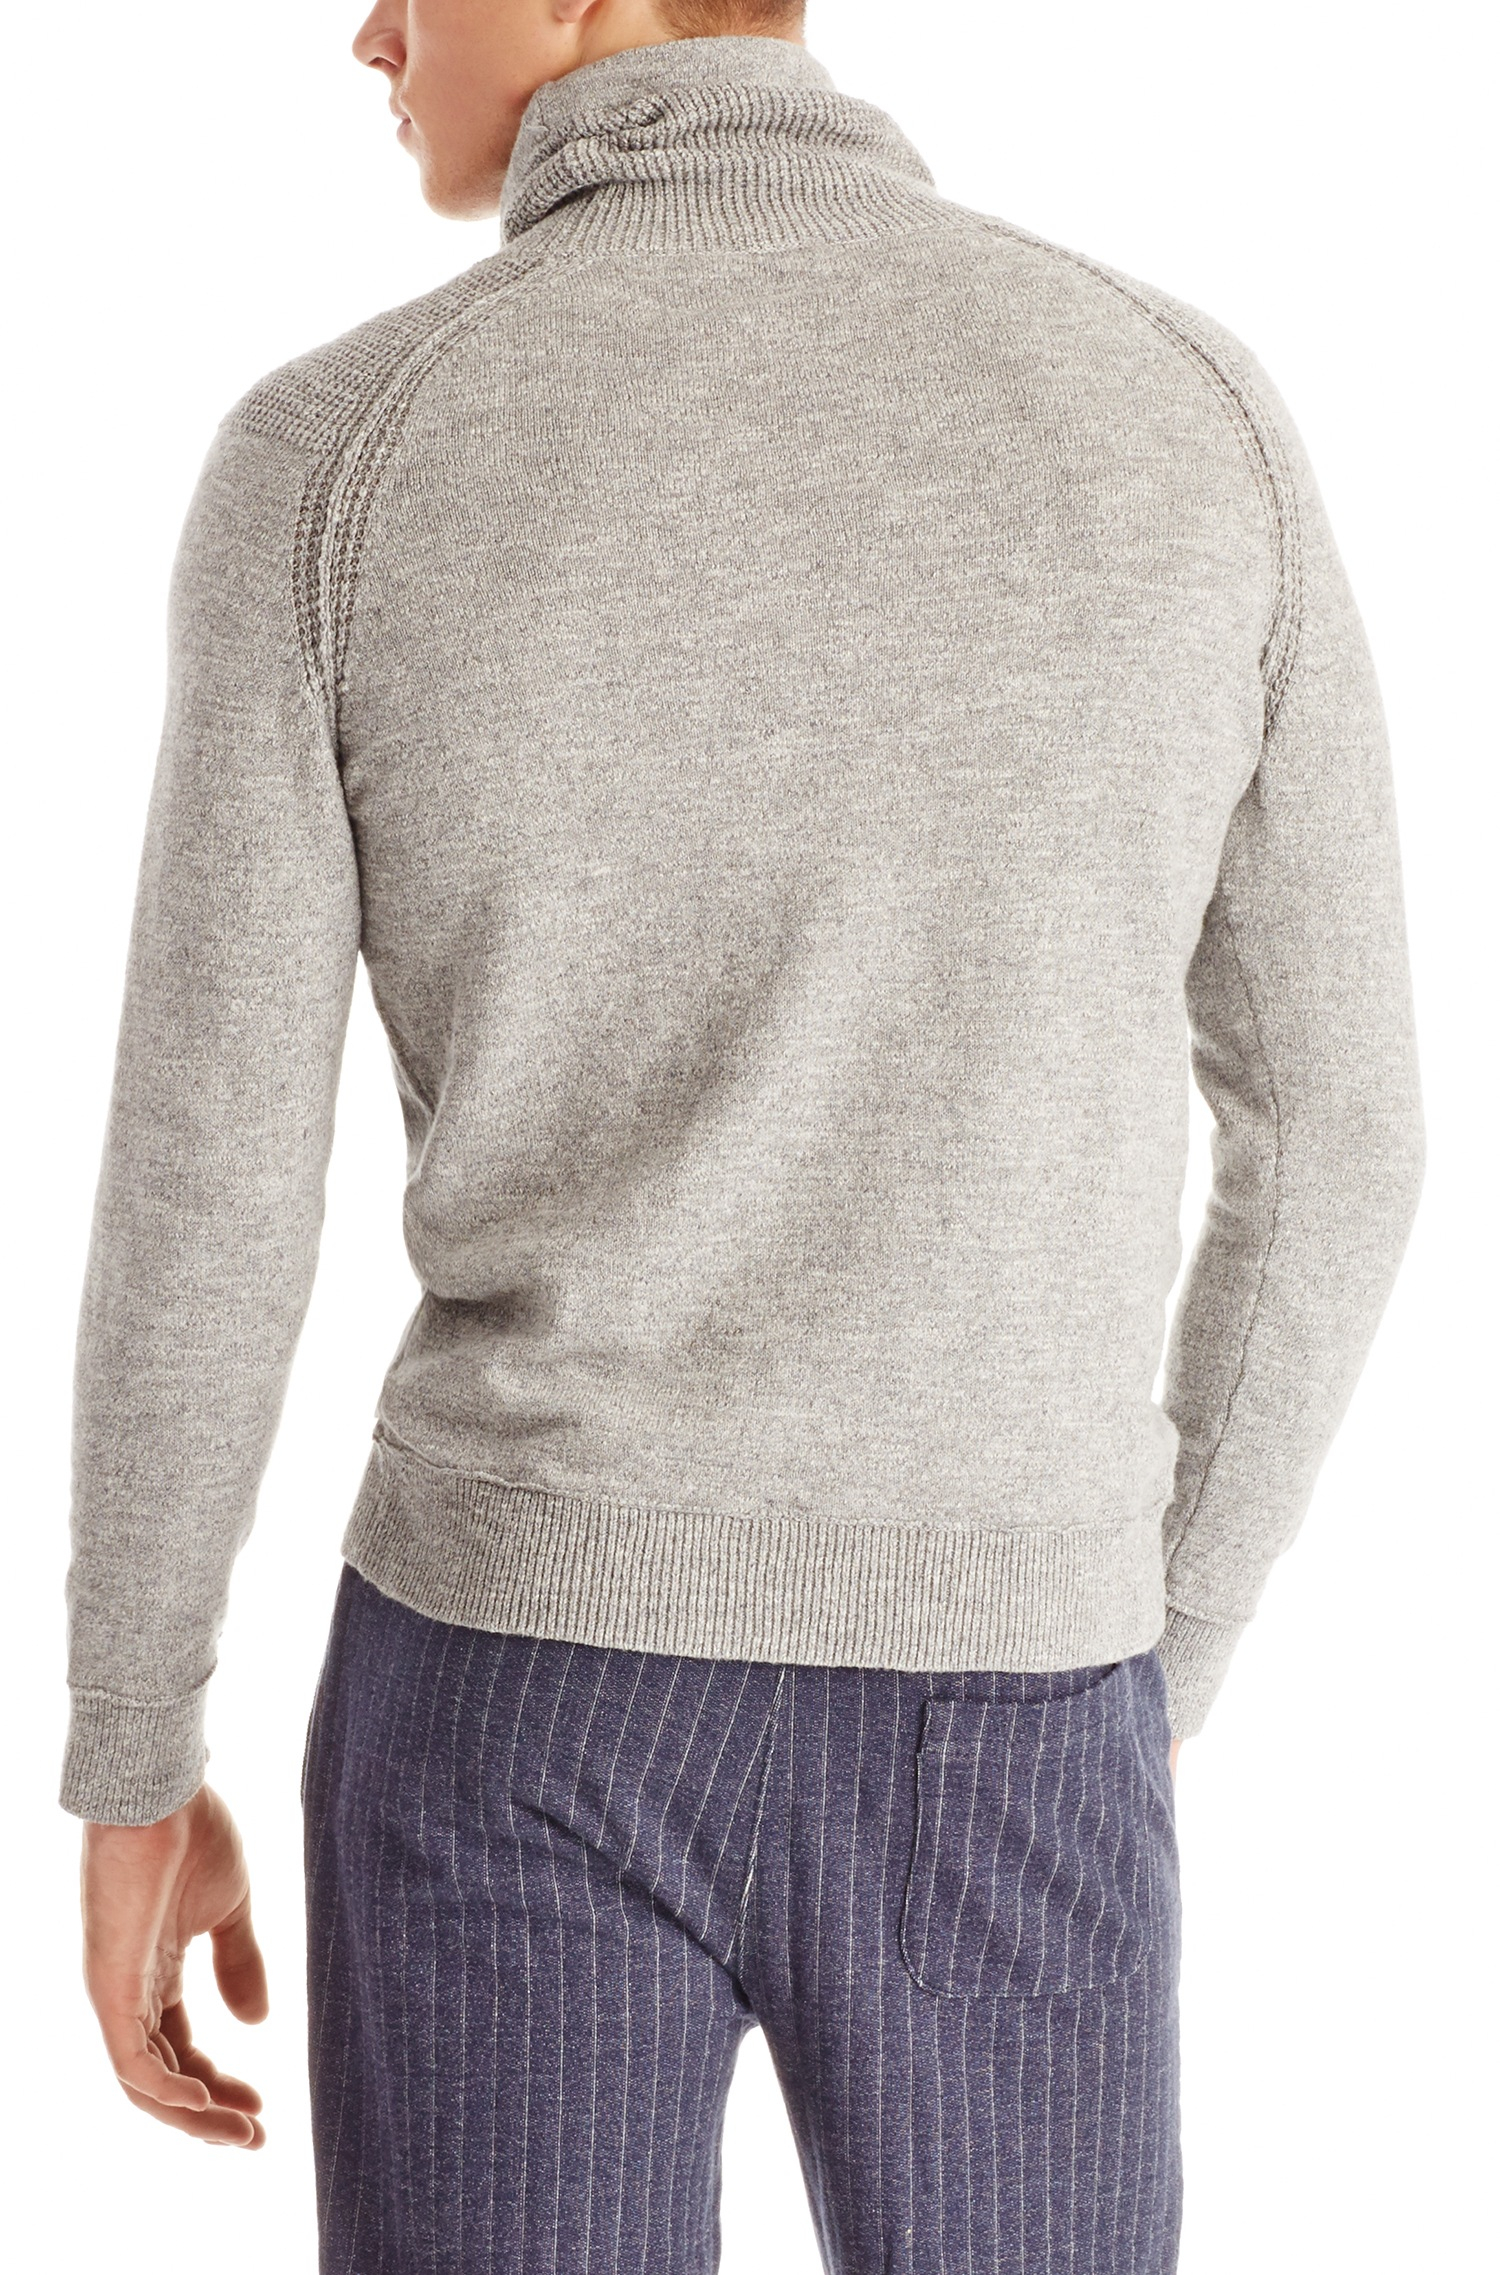 boss orange 39 acelin 39 cotton pullover sweater in gray for. Black Bedroom Furniture Sets. Home Design Ideas